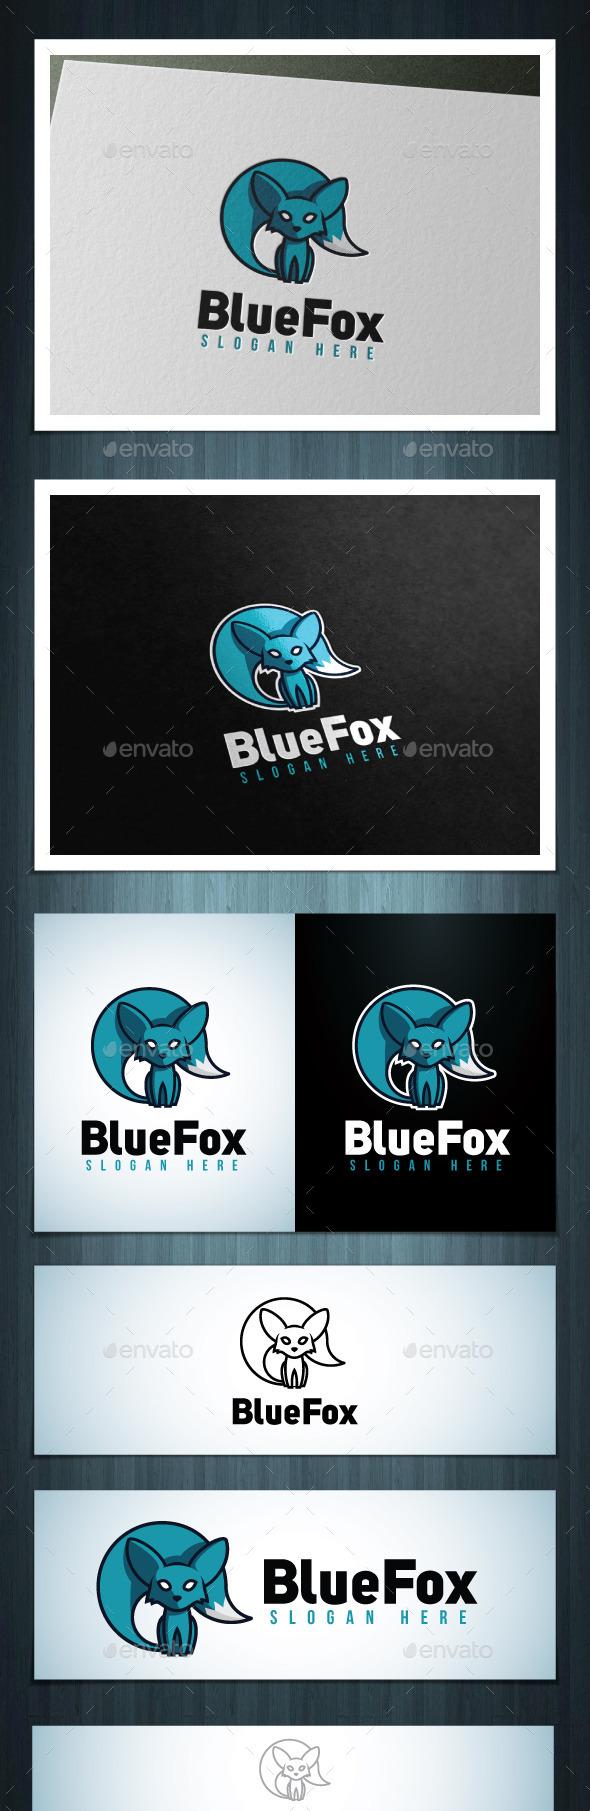 Blue Fox - Vector Abstract